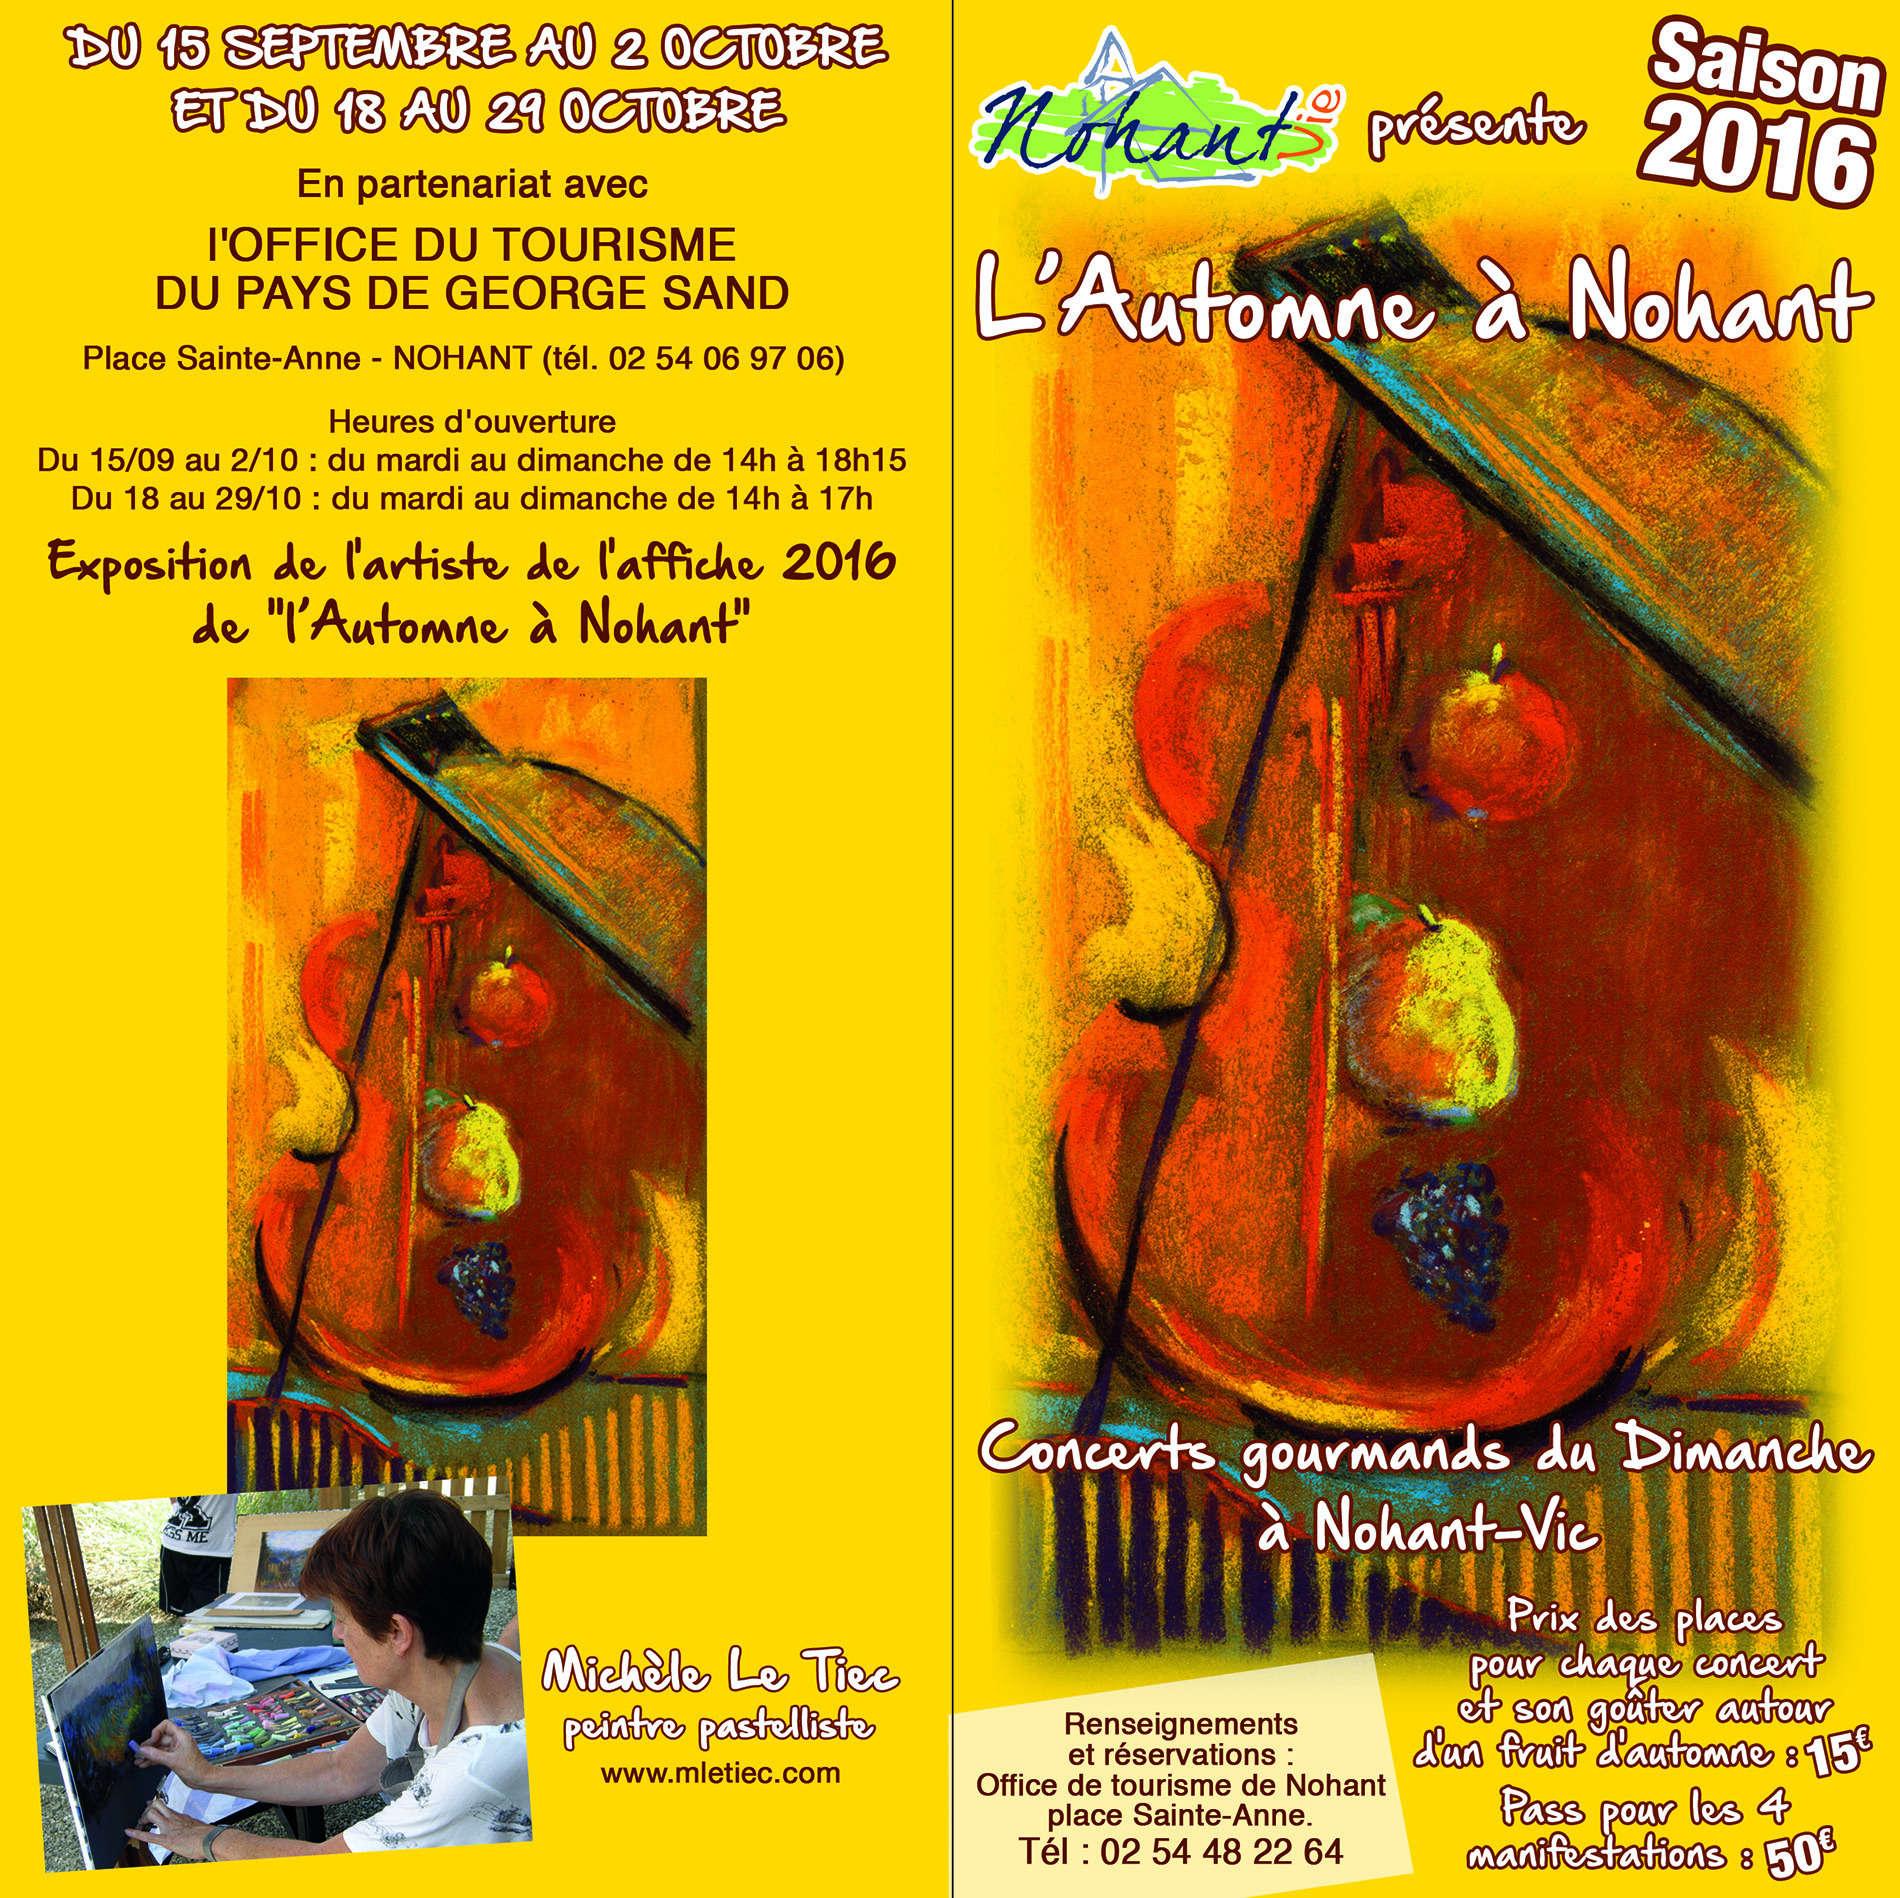 2016 09 automne-a-nohant_nohant vie